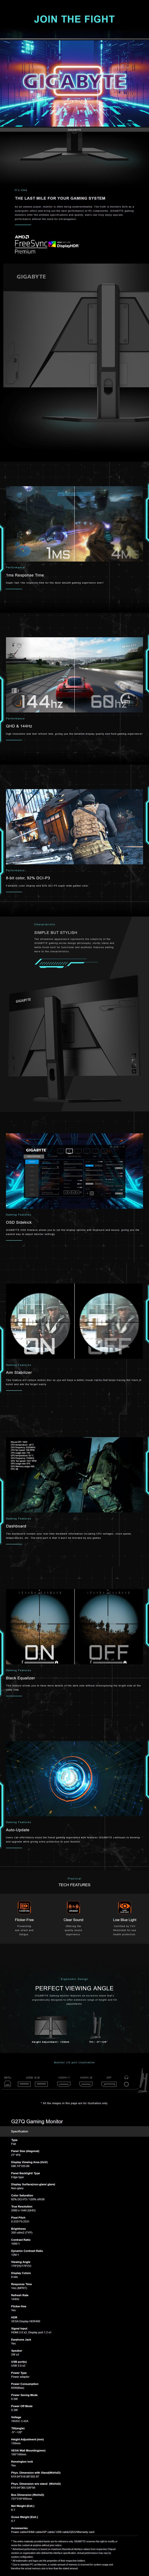 "Gigabyte G27Q 27"" 144Hz QHD 1ms HDR FreeSync Premium IPS Gaming Monitor - Desktop Overview 1"